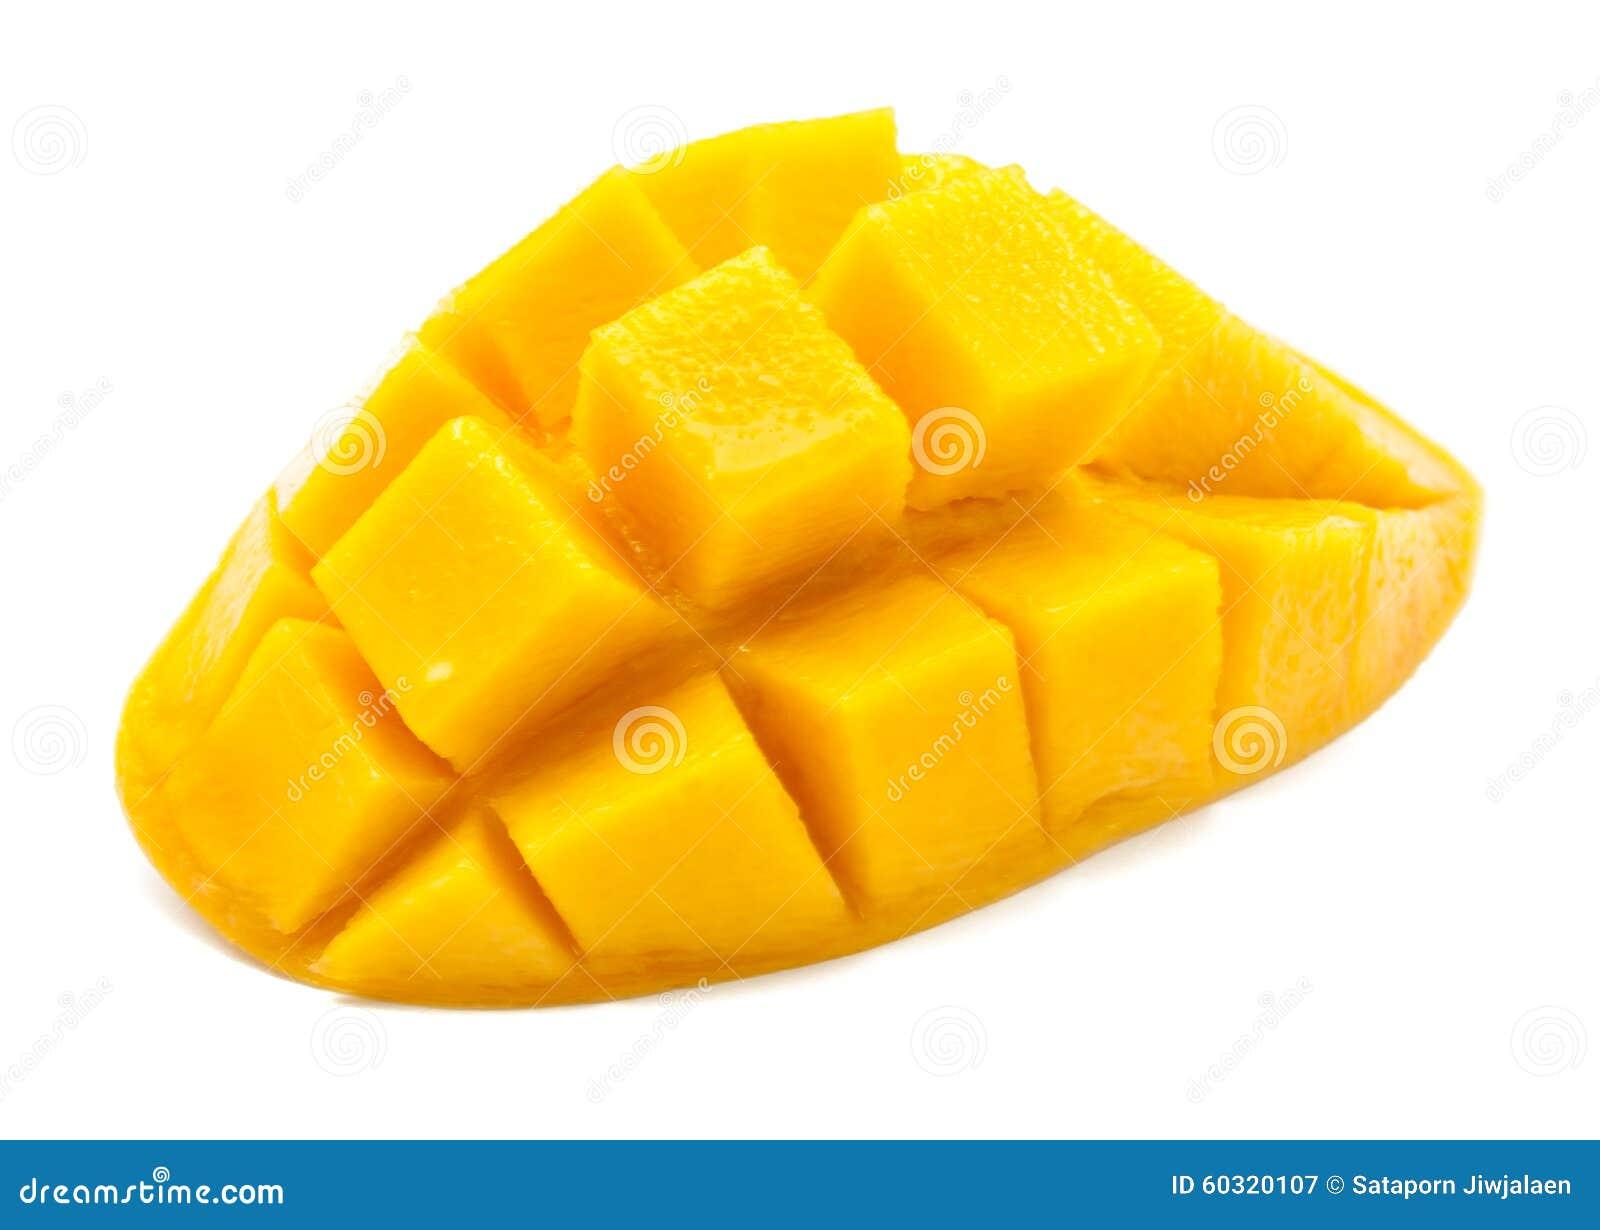 slice of mango stock image image of eating juice color 60320107